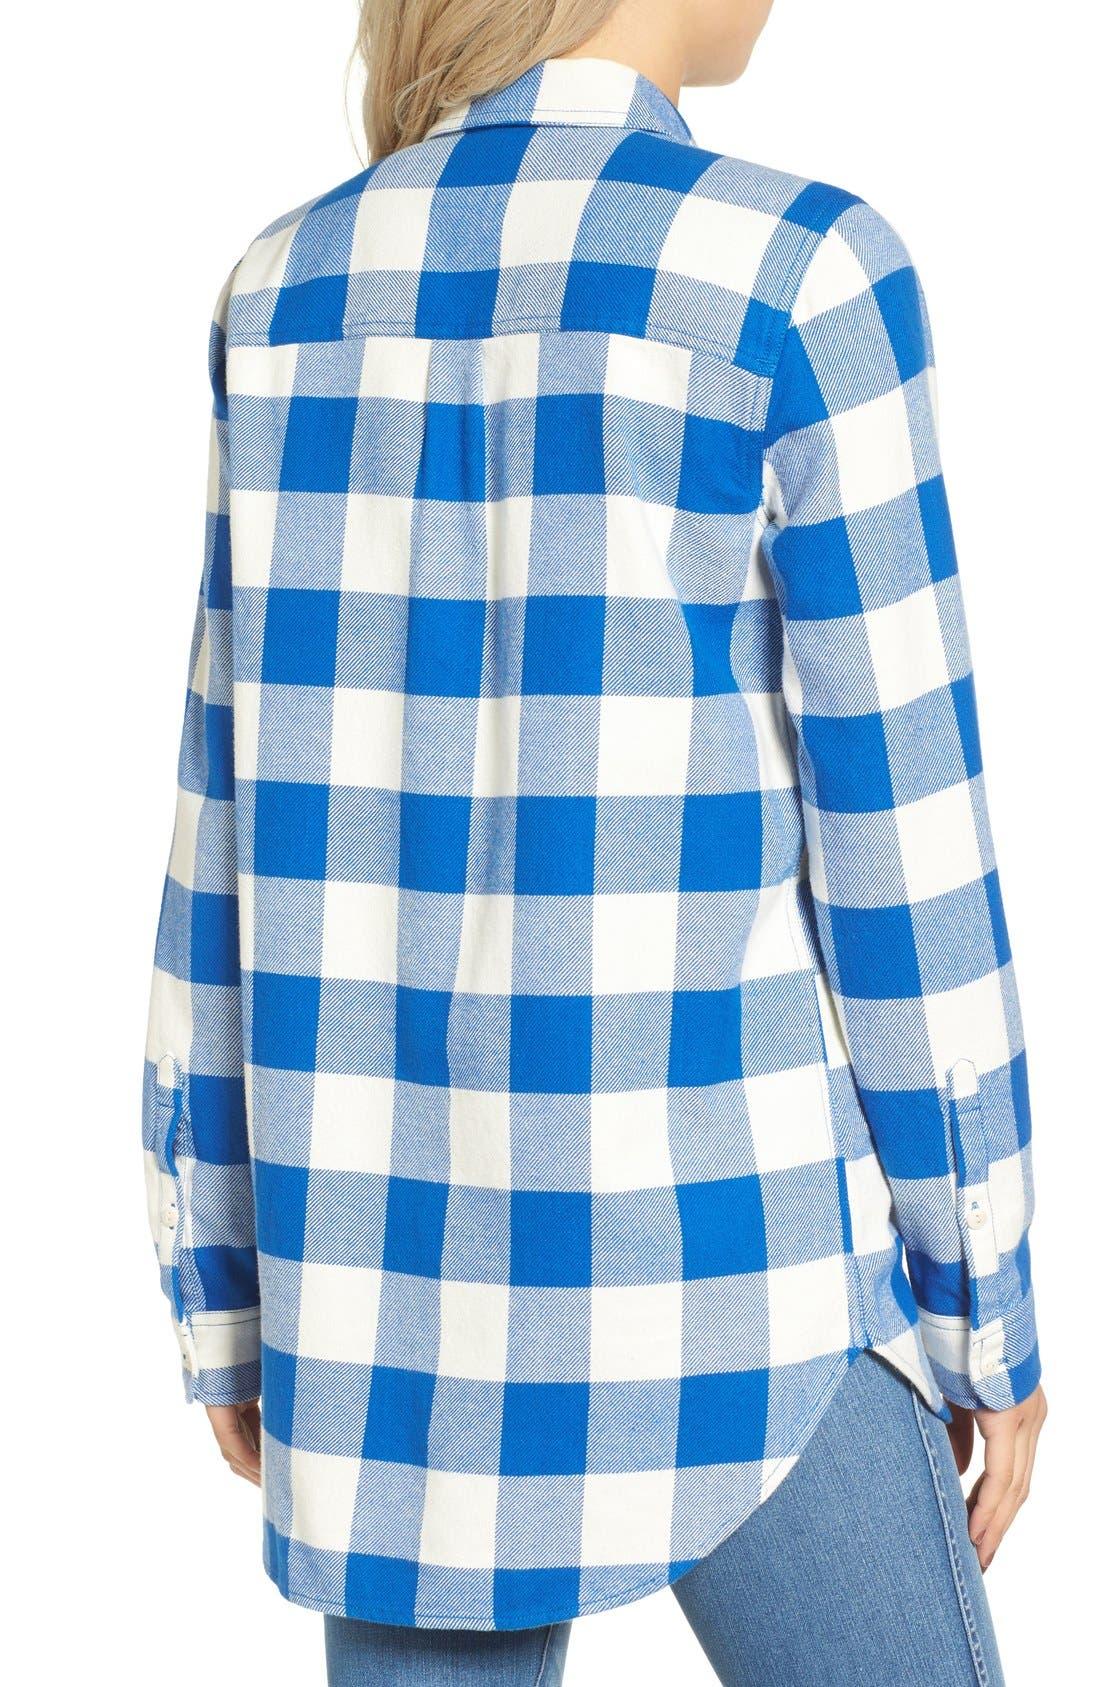 Alternate Image 2  - Madewell Ex Boyfriend Shirt